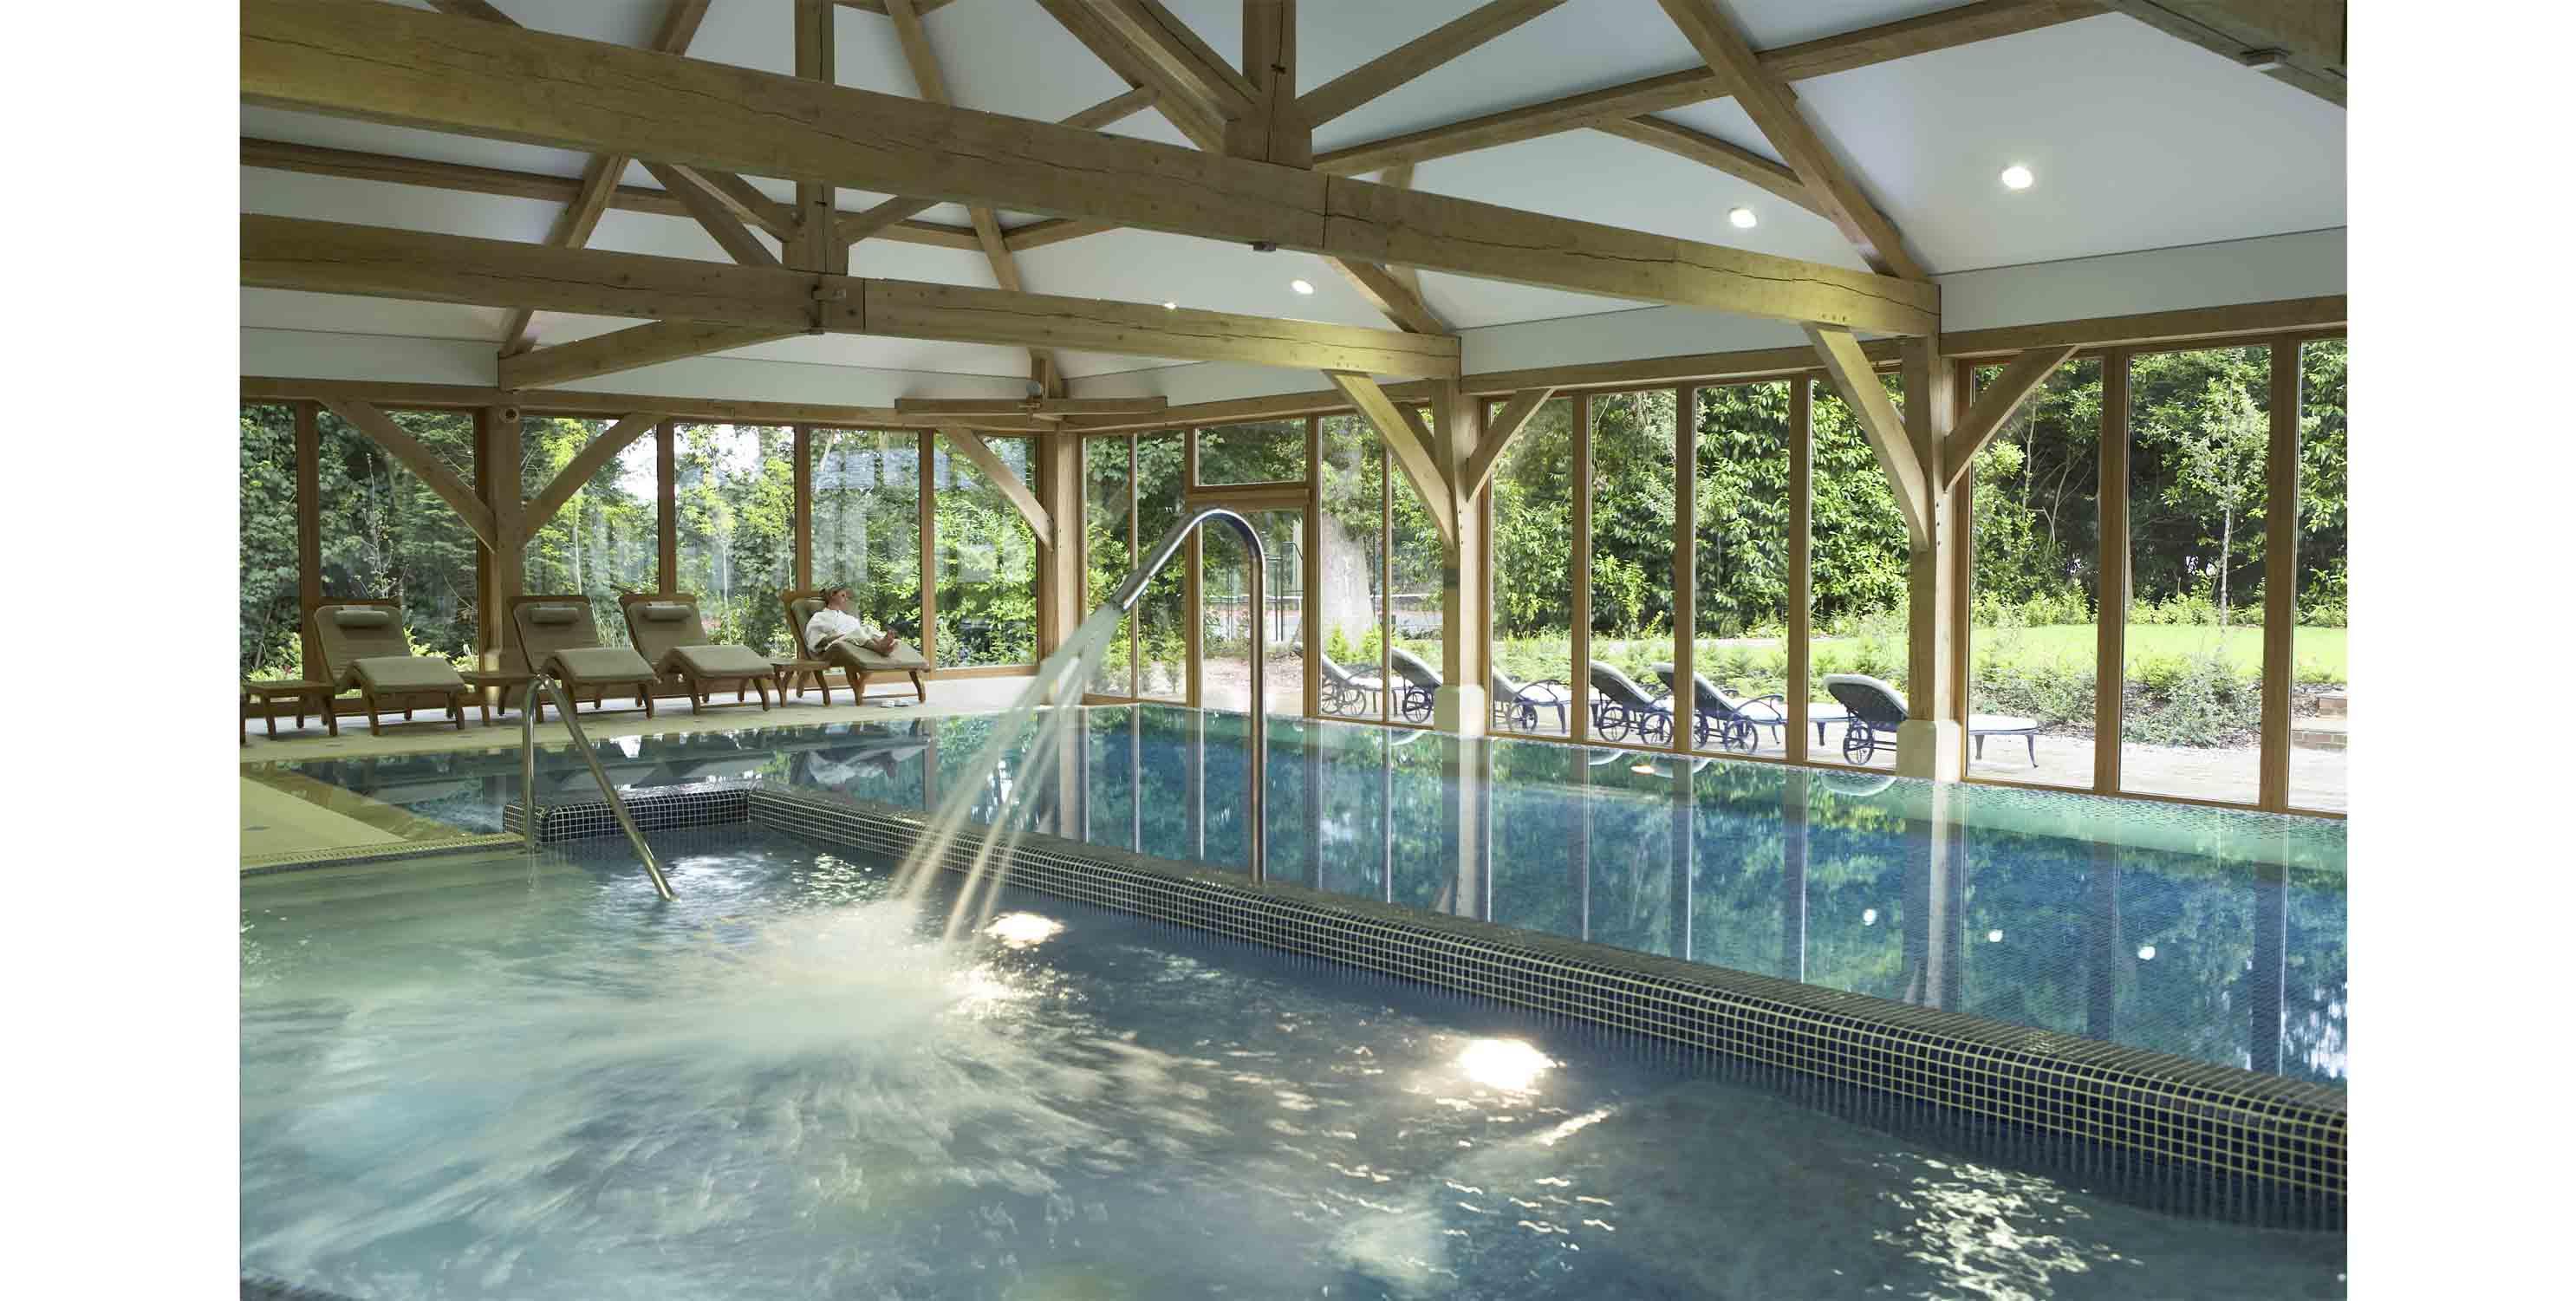 Luton Hoo Hotel Spa Treatments